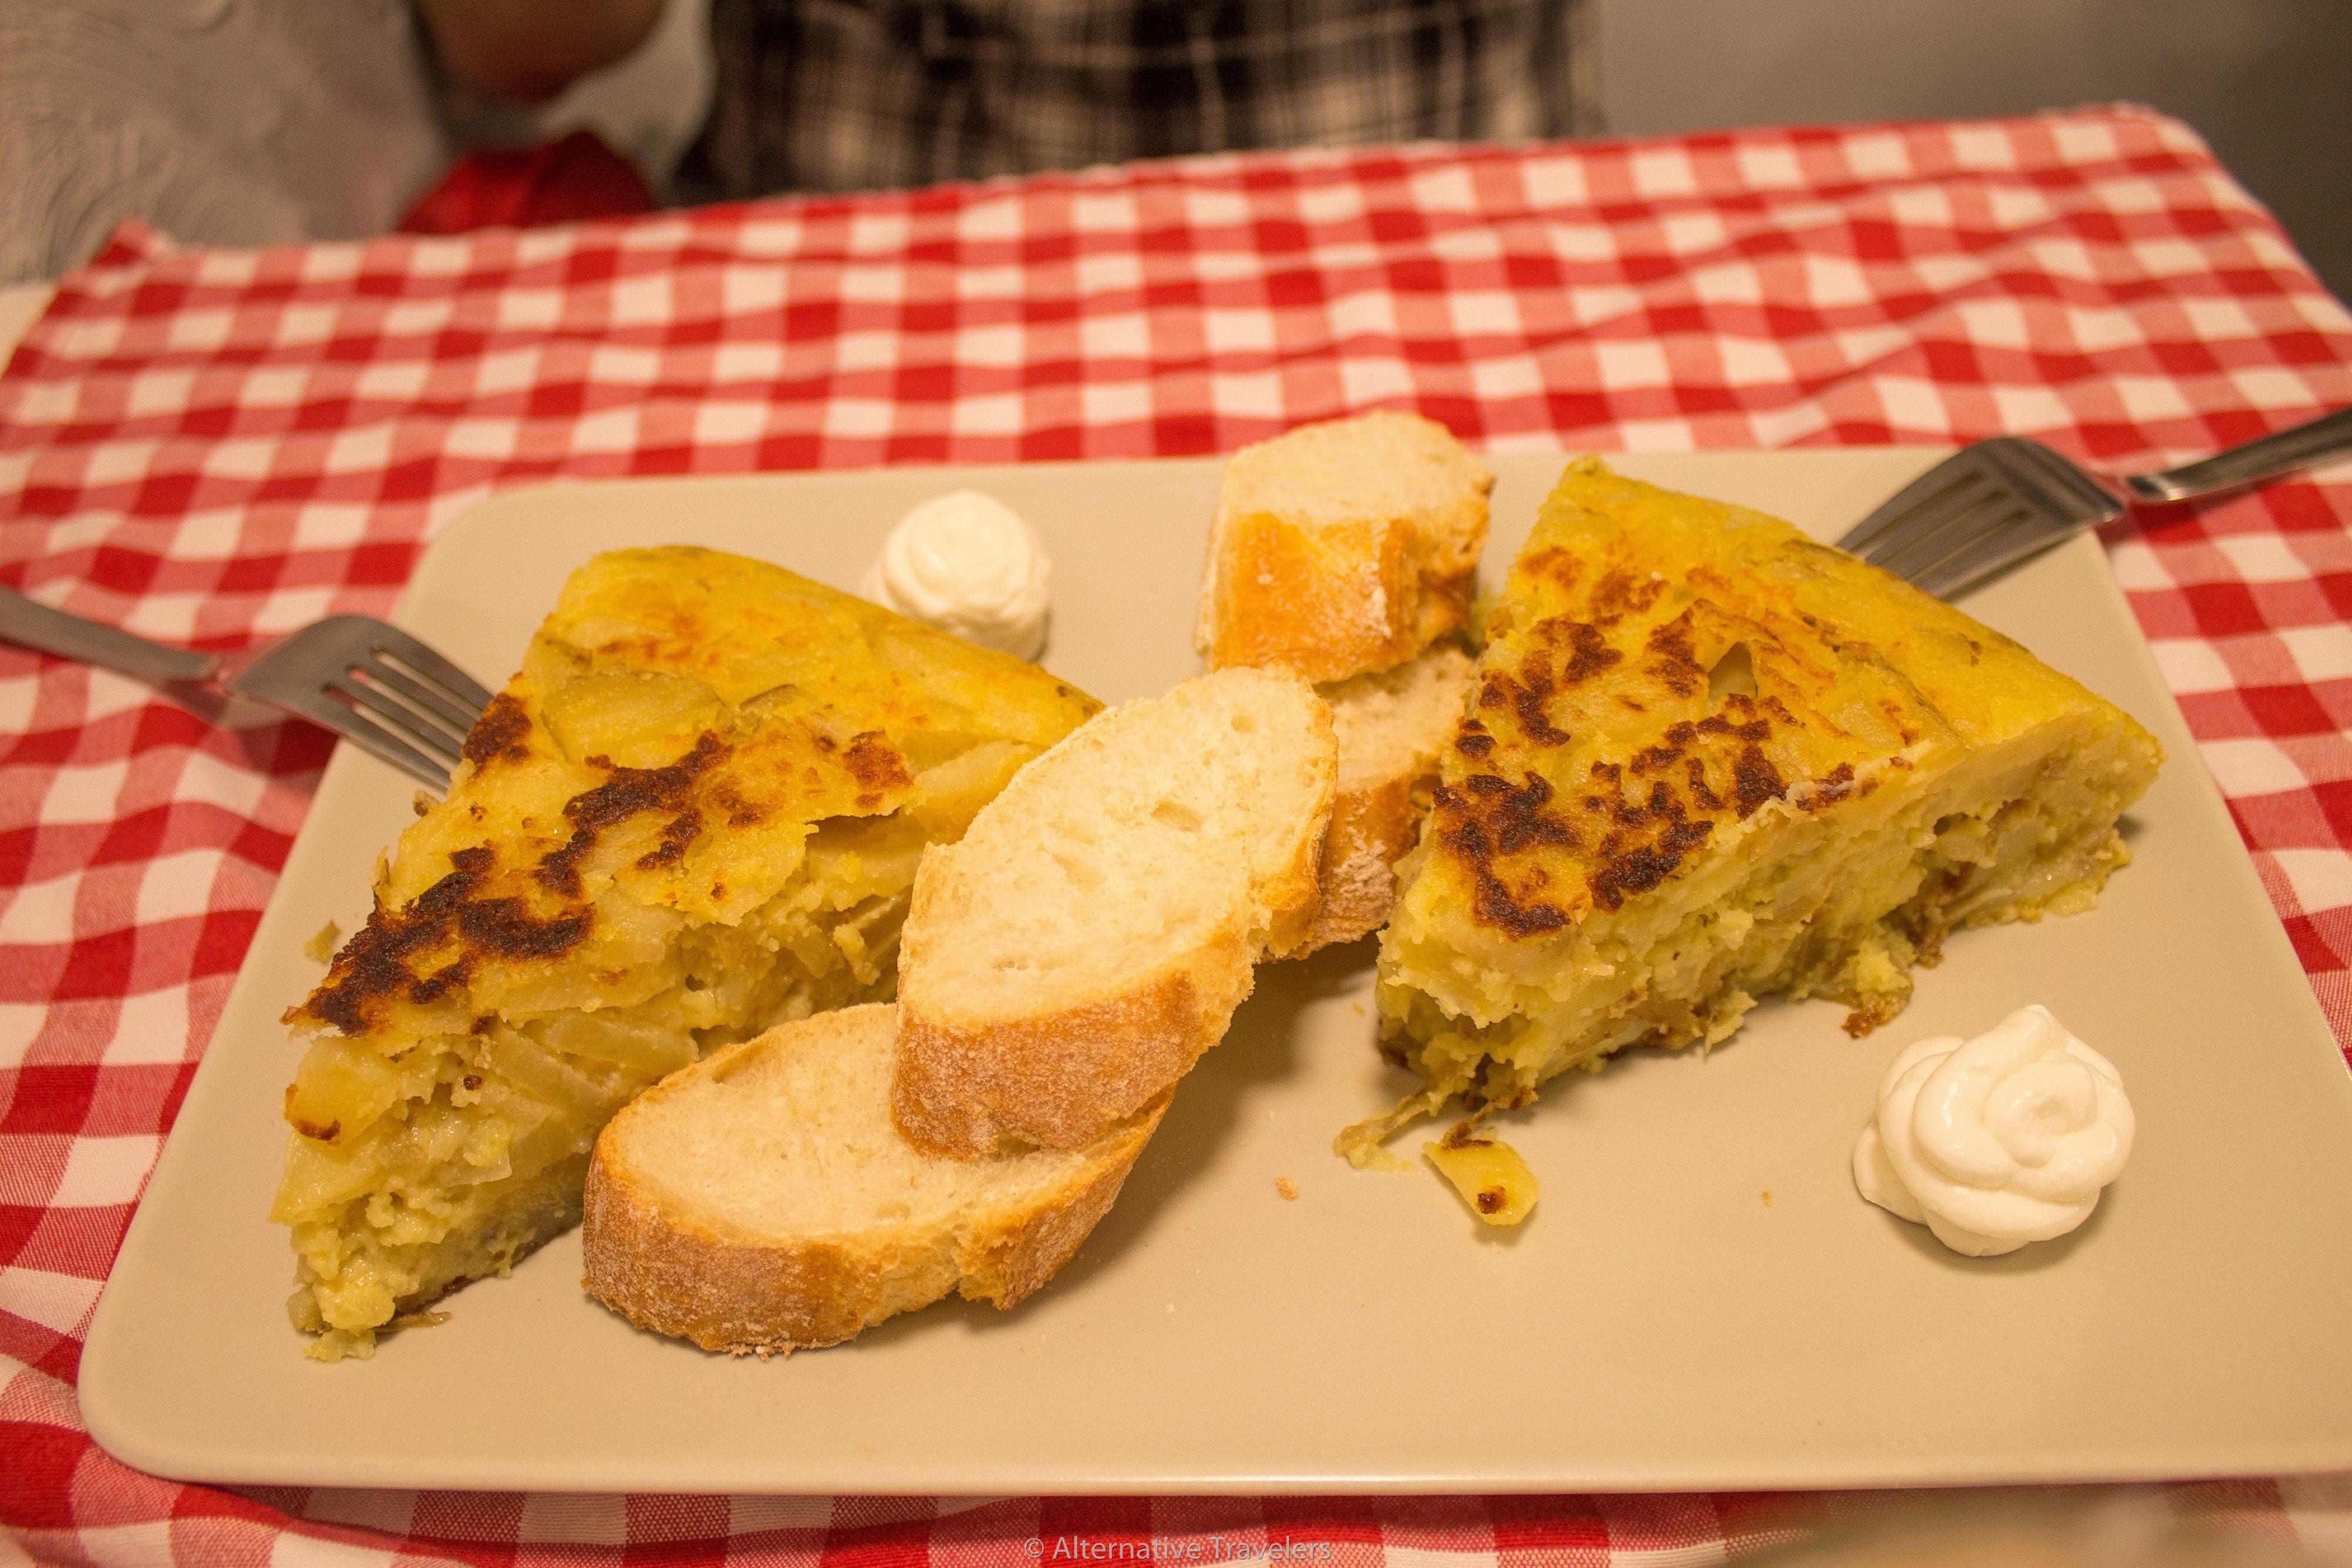 Best Vegan Tortilla in Madrid - Distrito Vegano | AlternativeTravelers.com